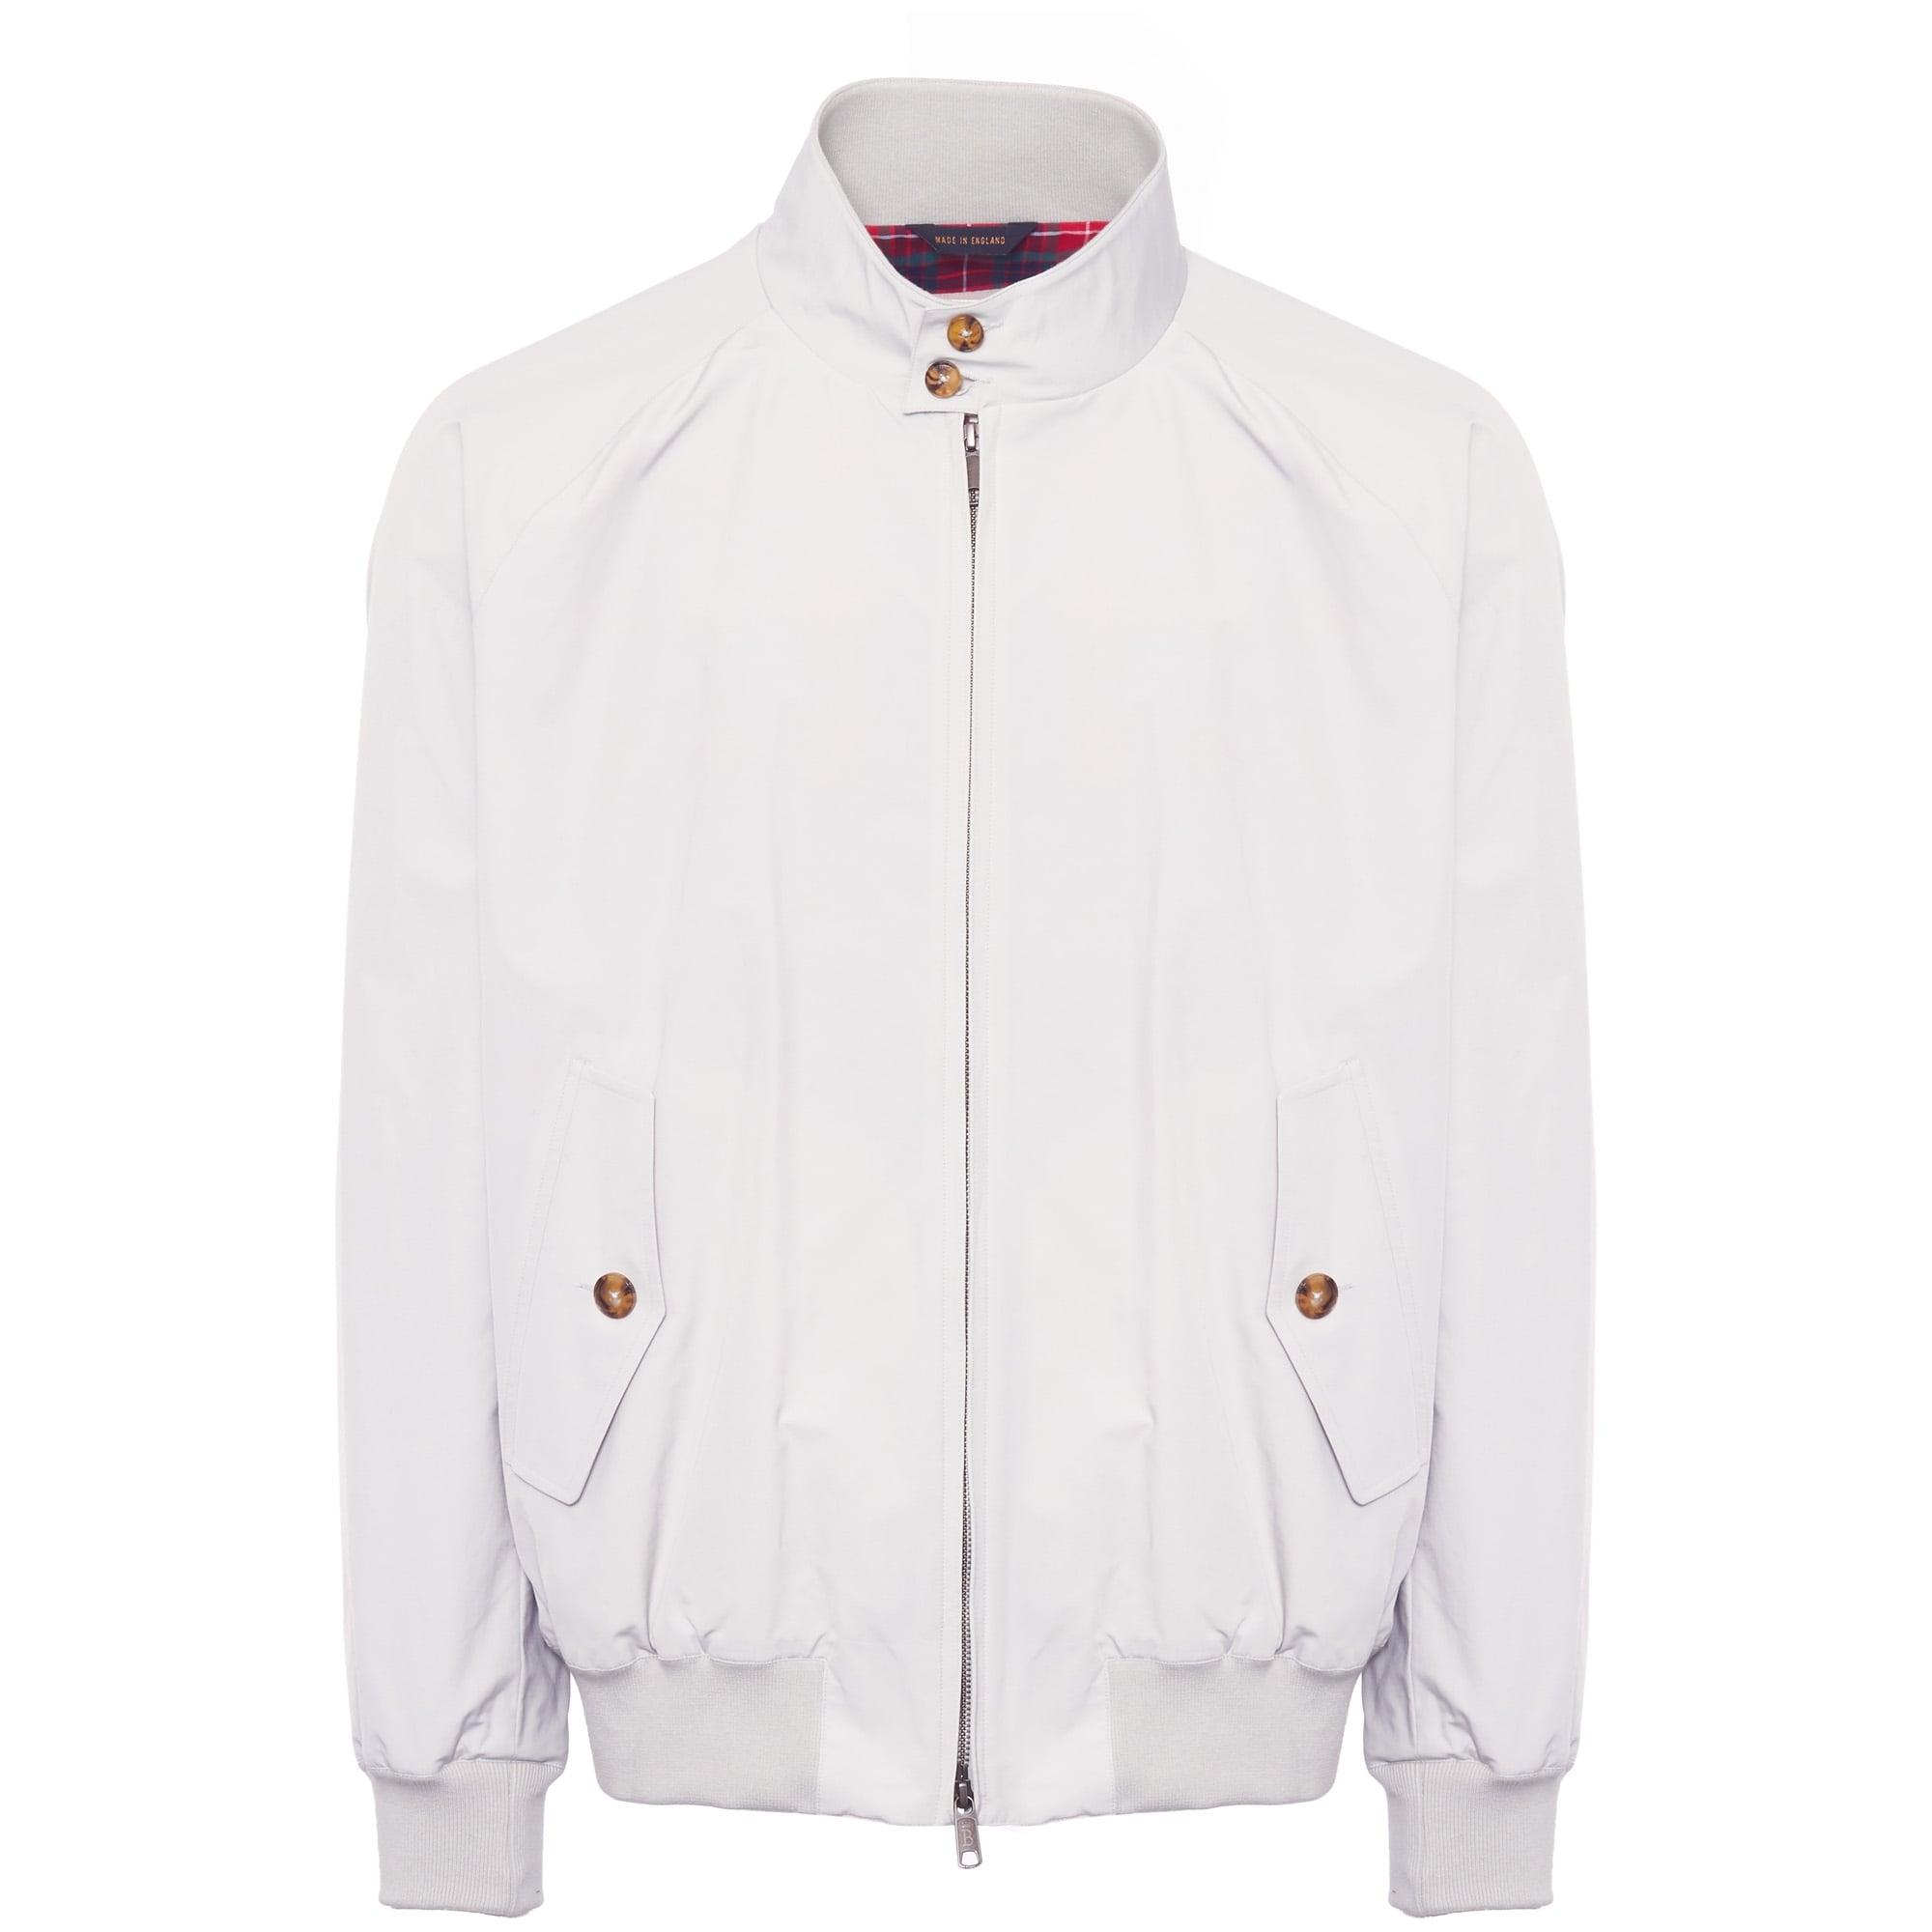 6a9fa77ac0ee5 Baracuta G9 Modern Classic Harrington Jacket - Mist